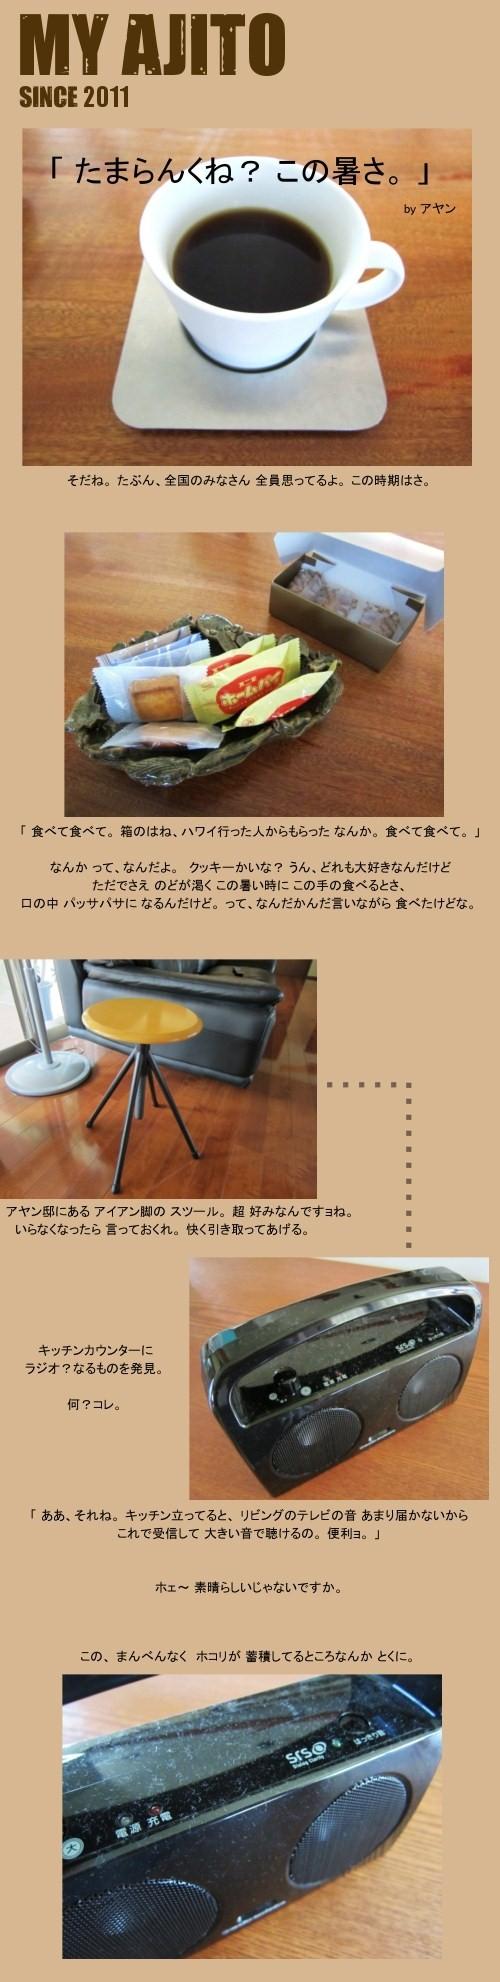 tsuke_03.jpg